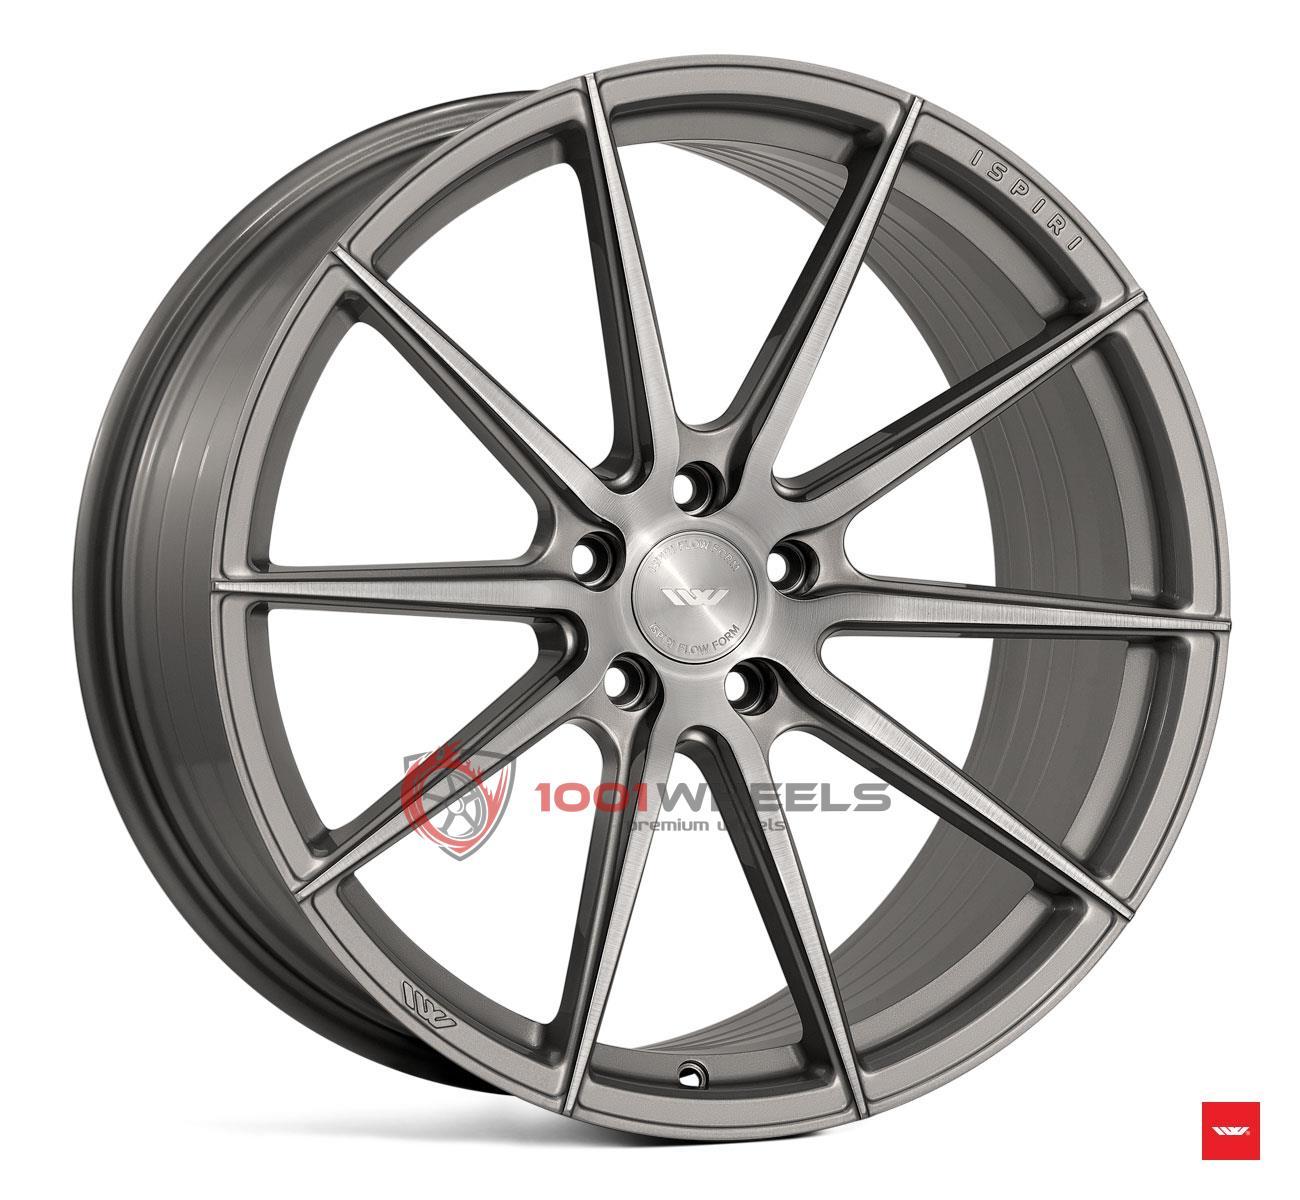 ISPIRI FFR1 carbon-grey-brushed